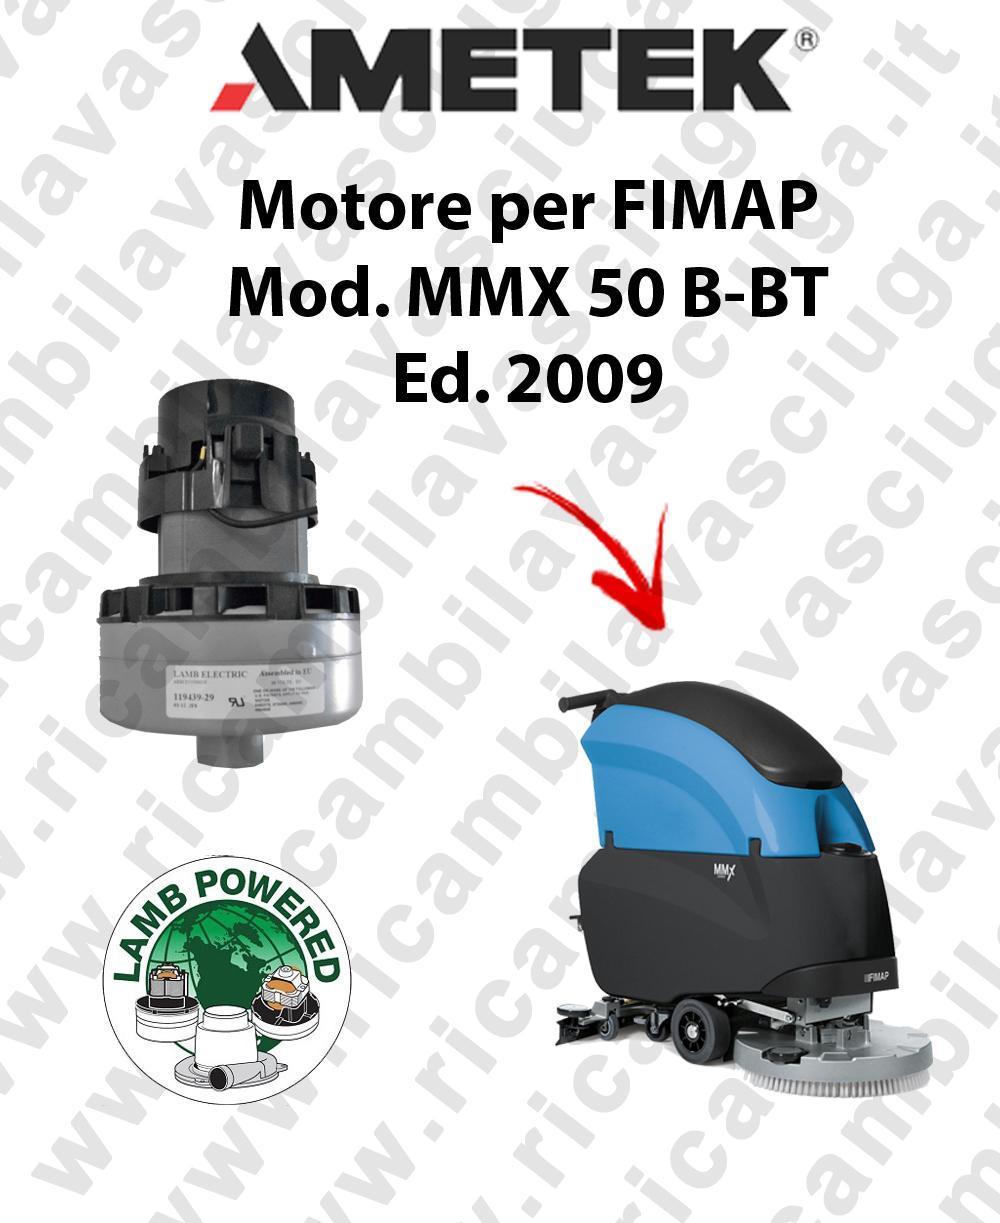 MMX 50 B-BT Ed. 2009 moteur aspiration LAMB AMETEK autolaveuses FIMAP